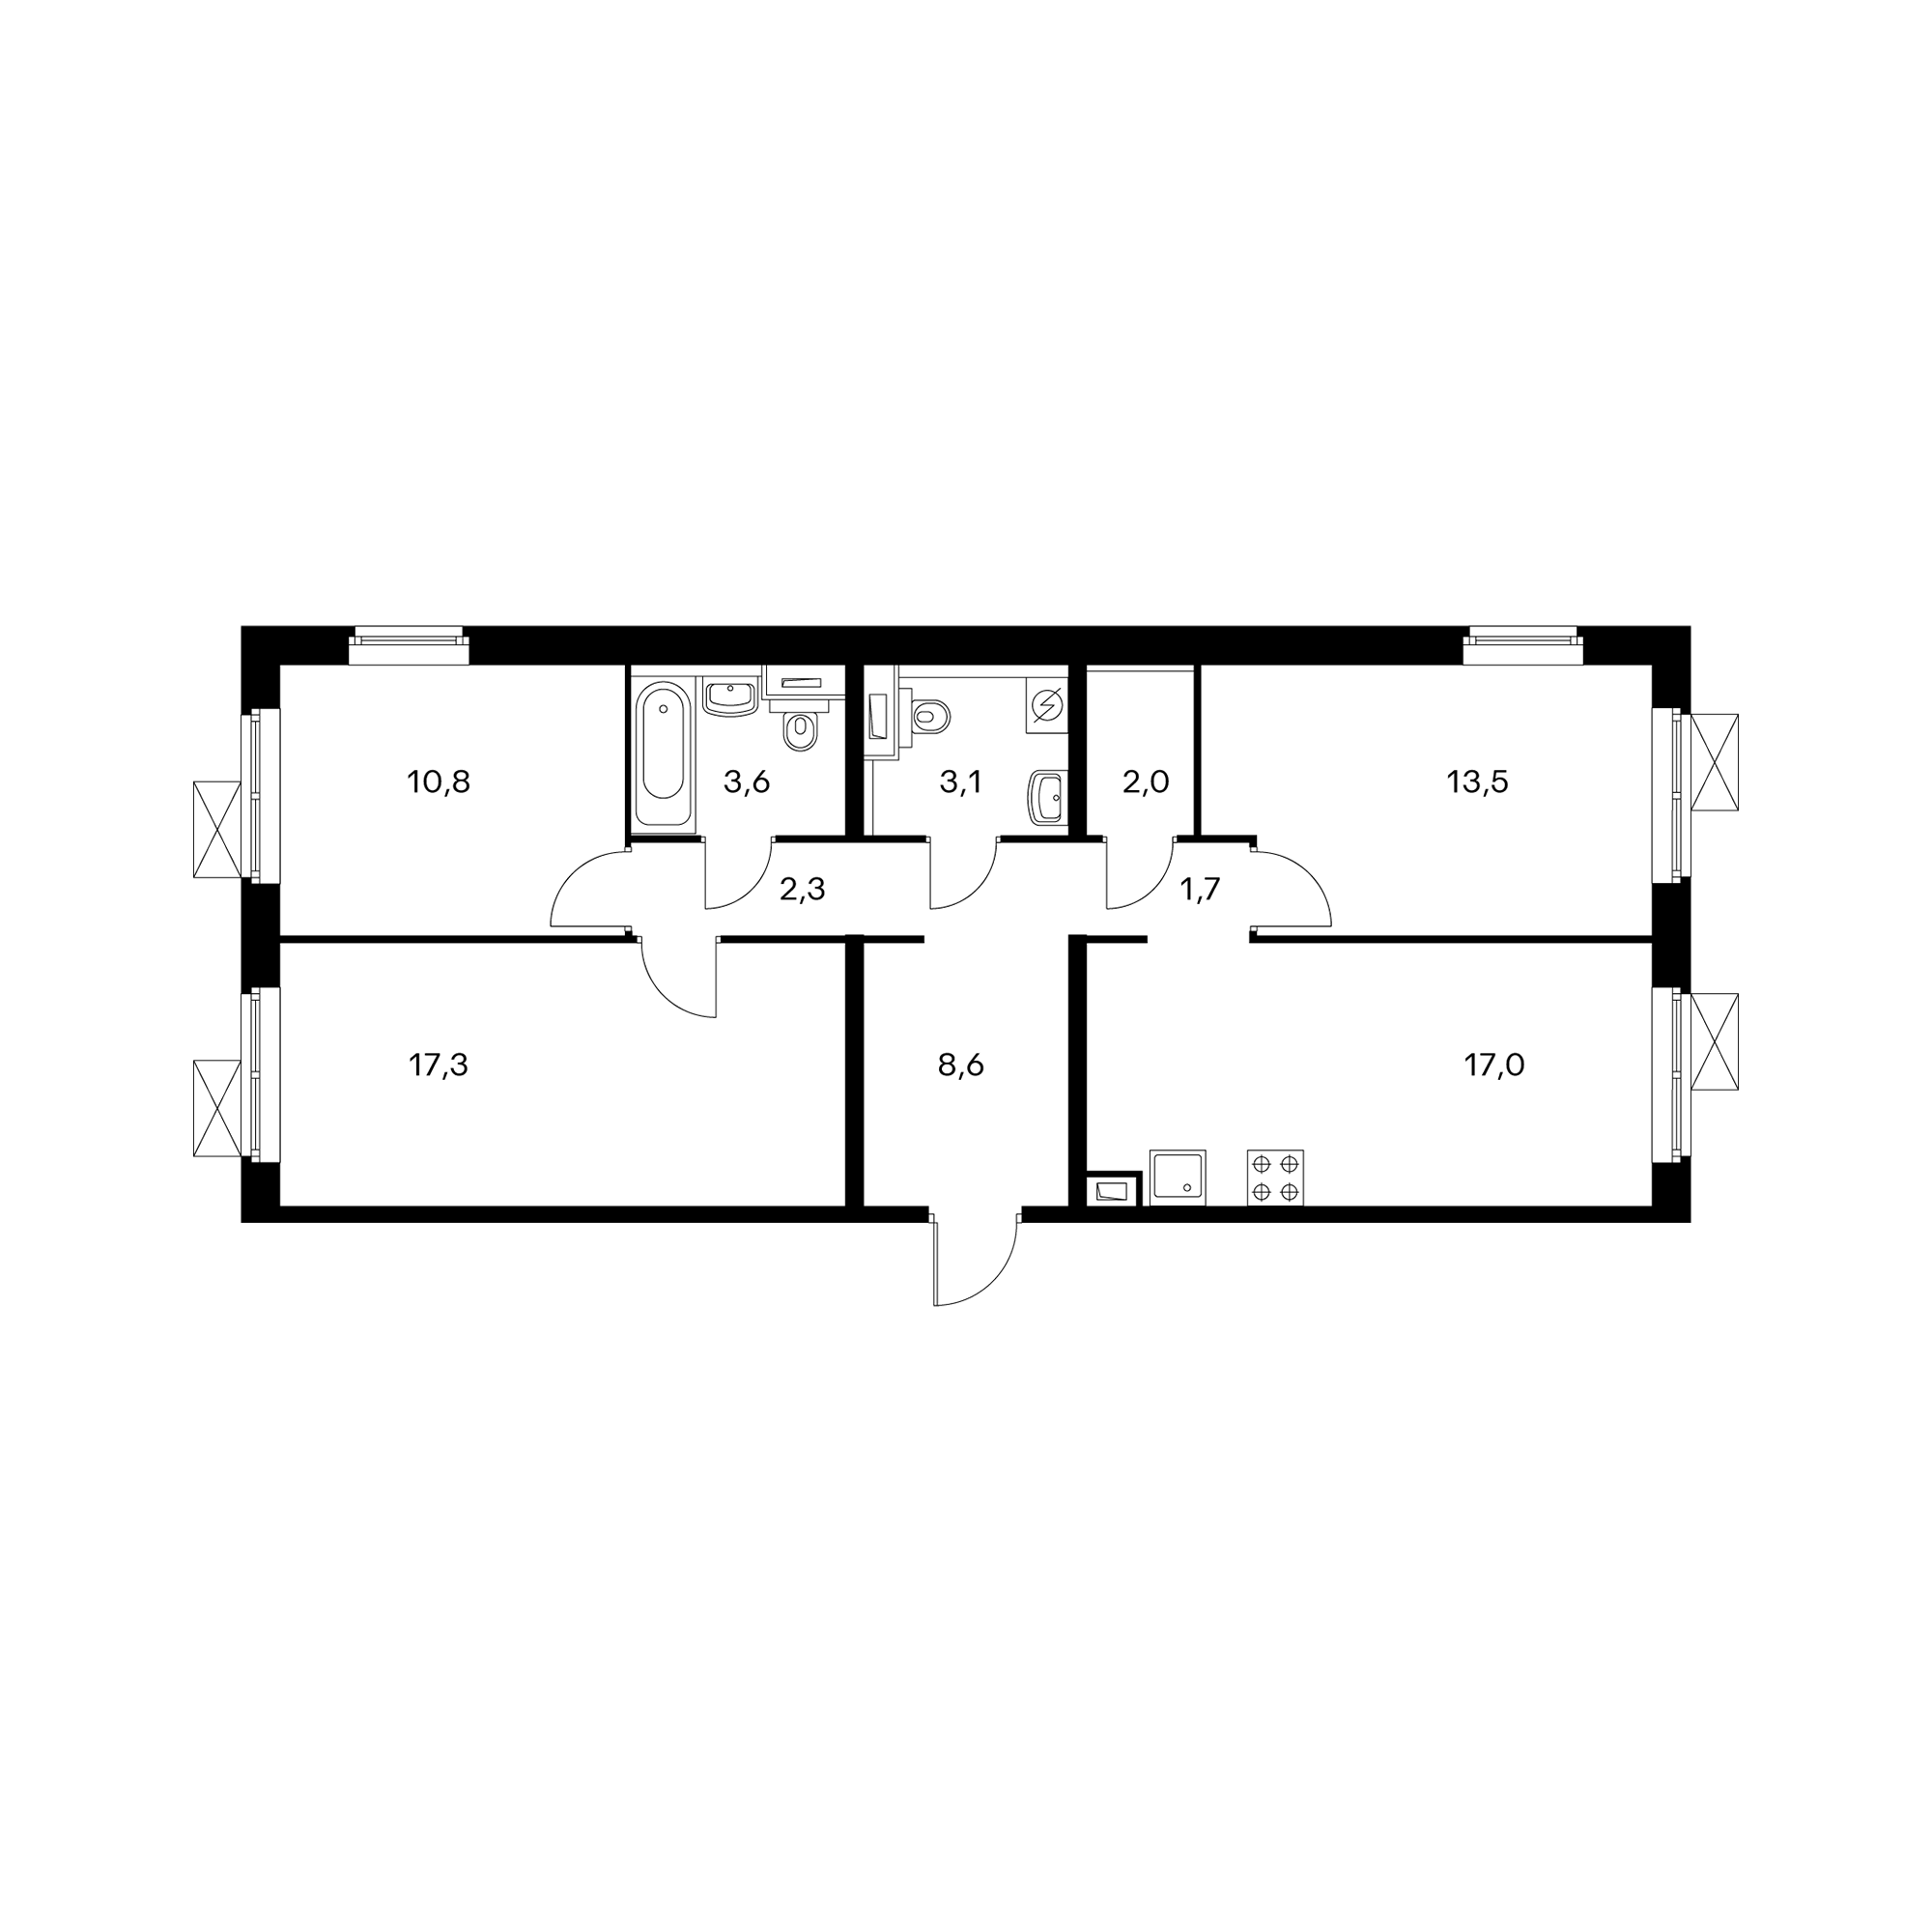 3KM16_6.0-1T